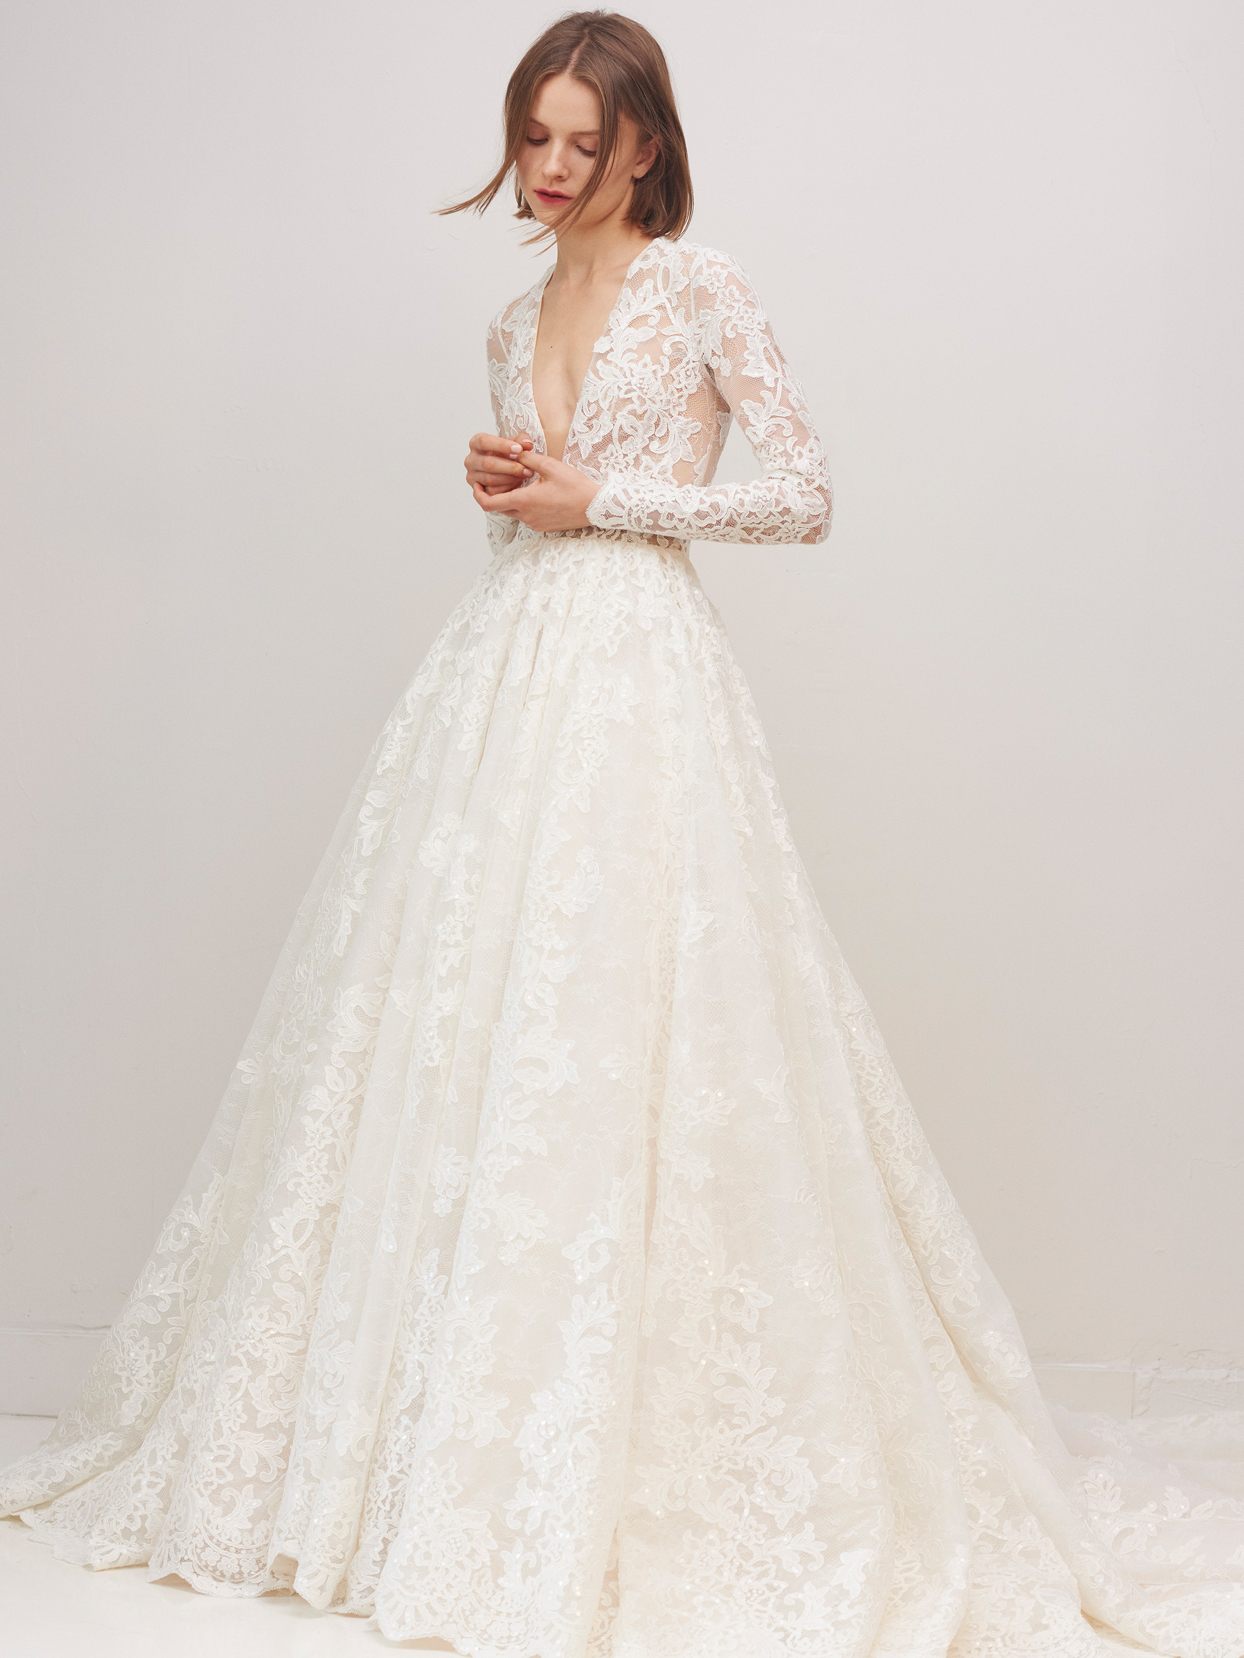 rivini by rita vinieris long sleeve lace a-line wedding dress fall 2020